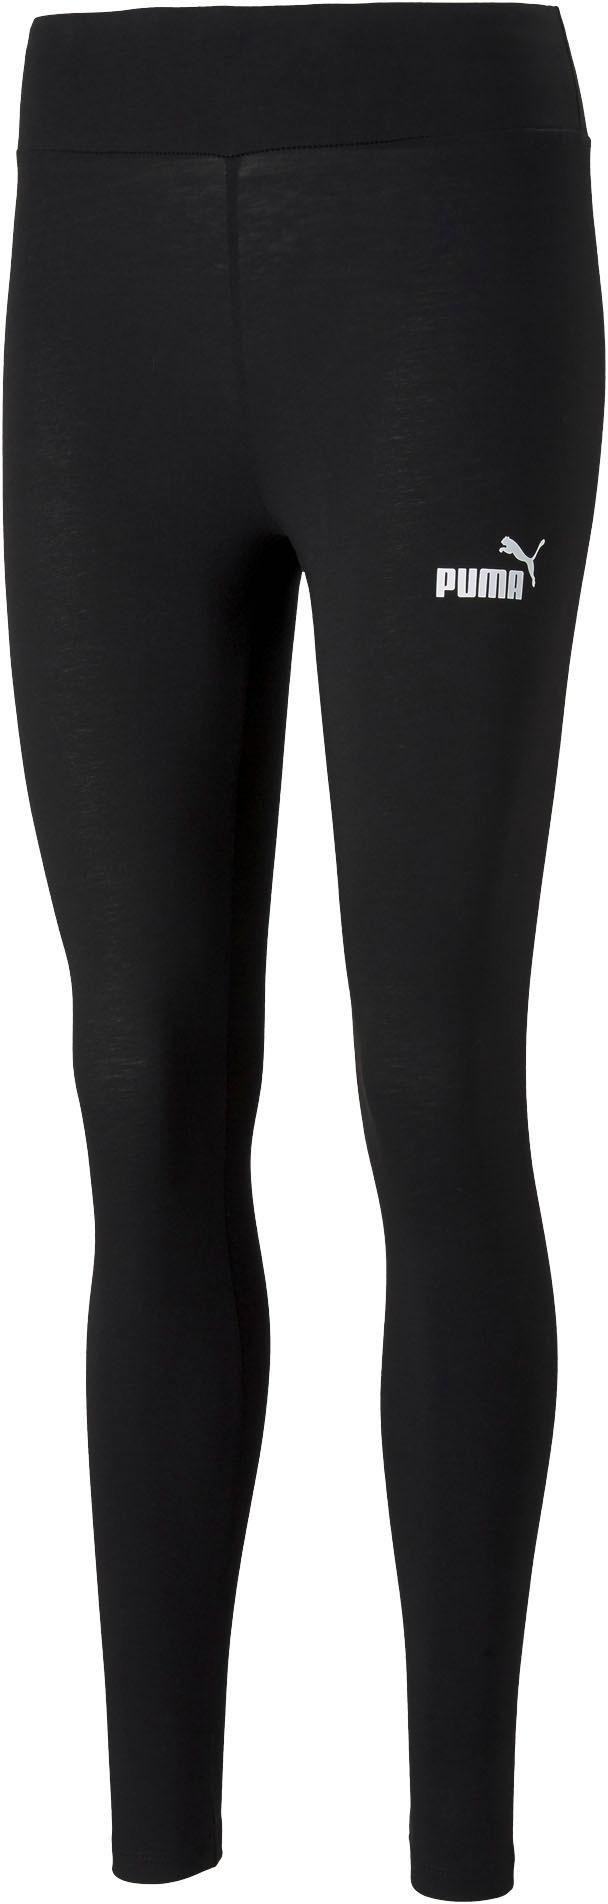 puma -  Leggings ESS Leggings